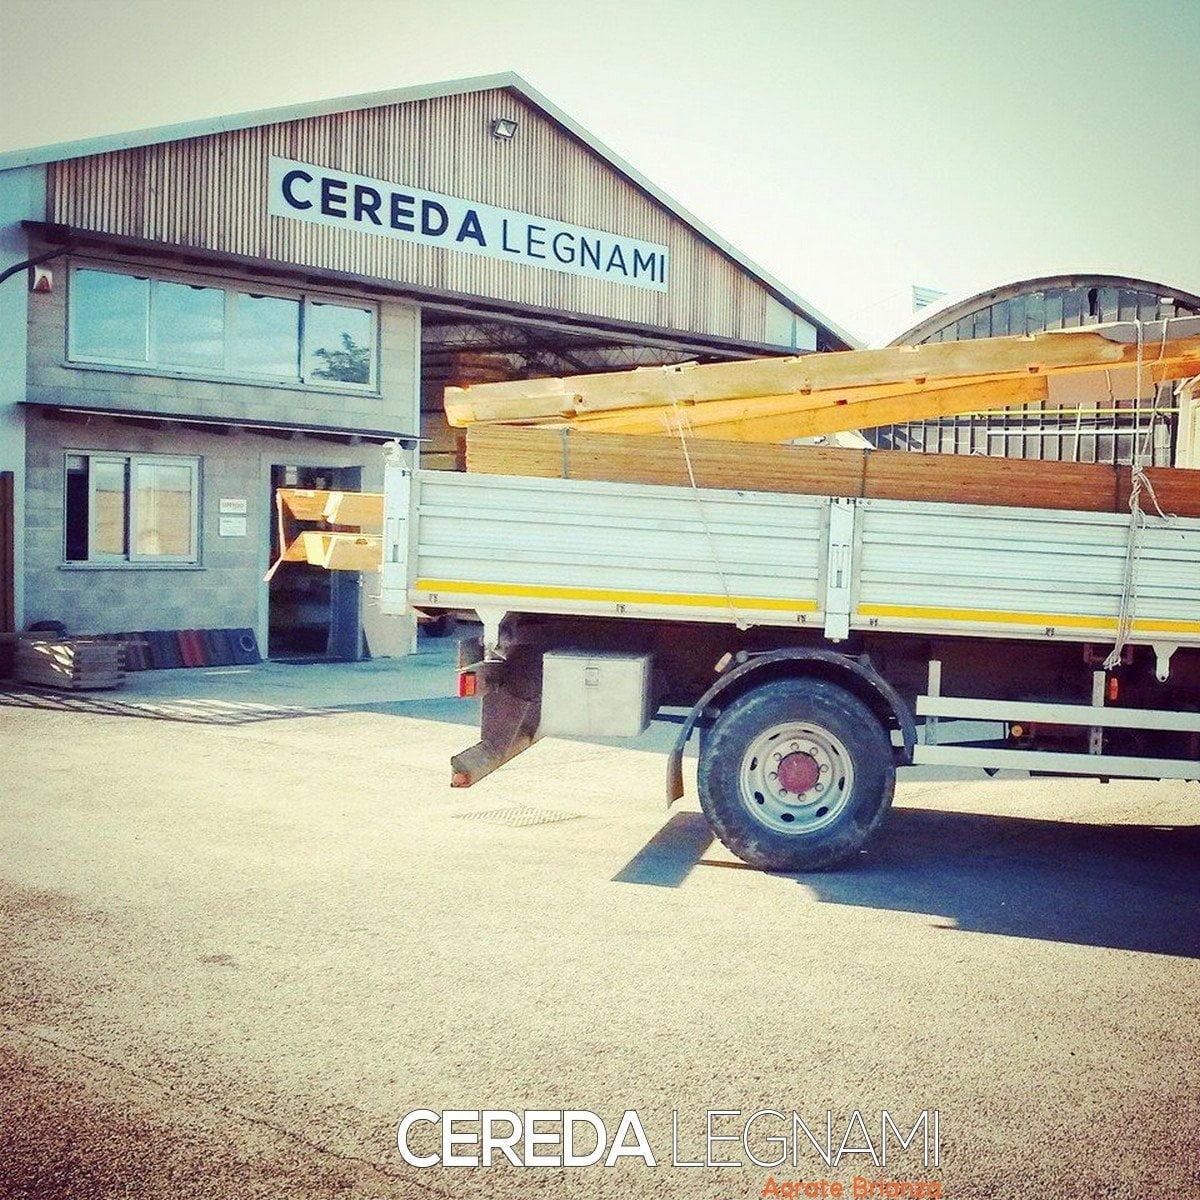 Legnami cereda legnami agrate brianza for Cereda legnami